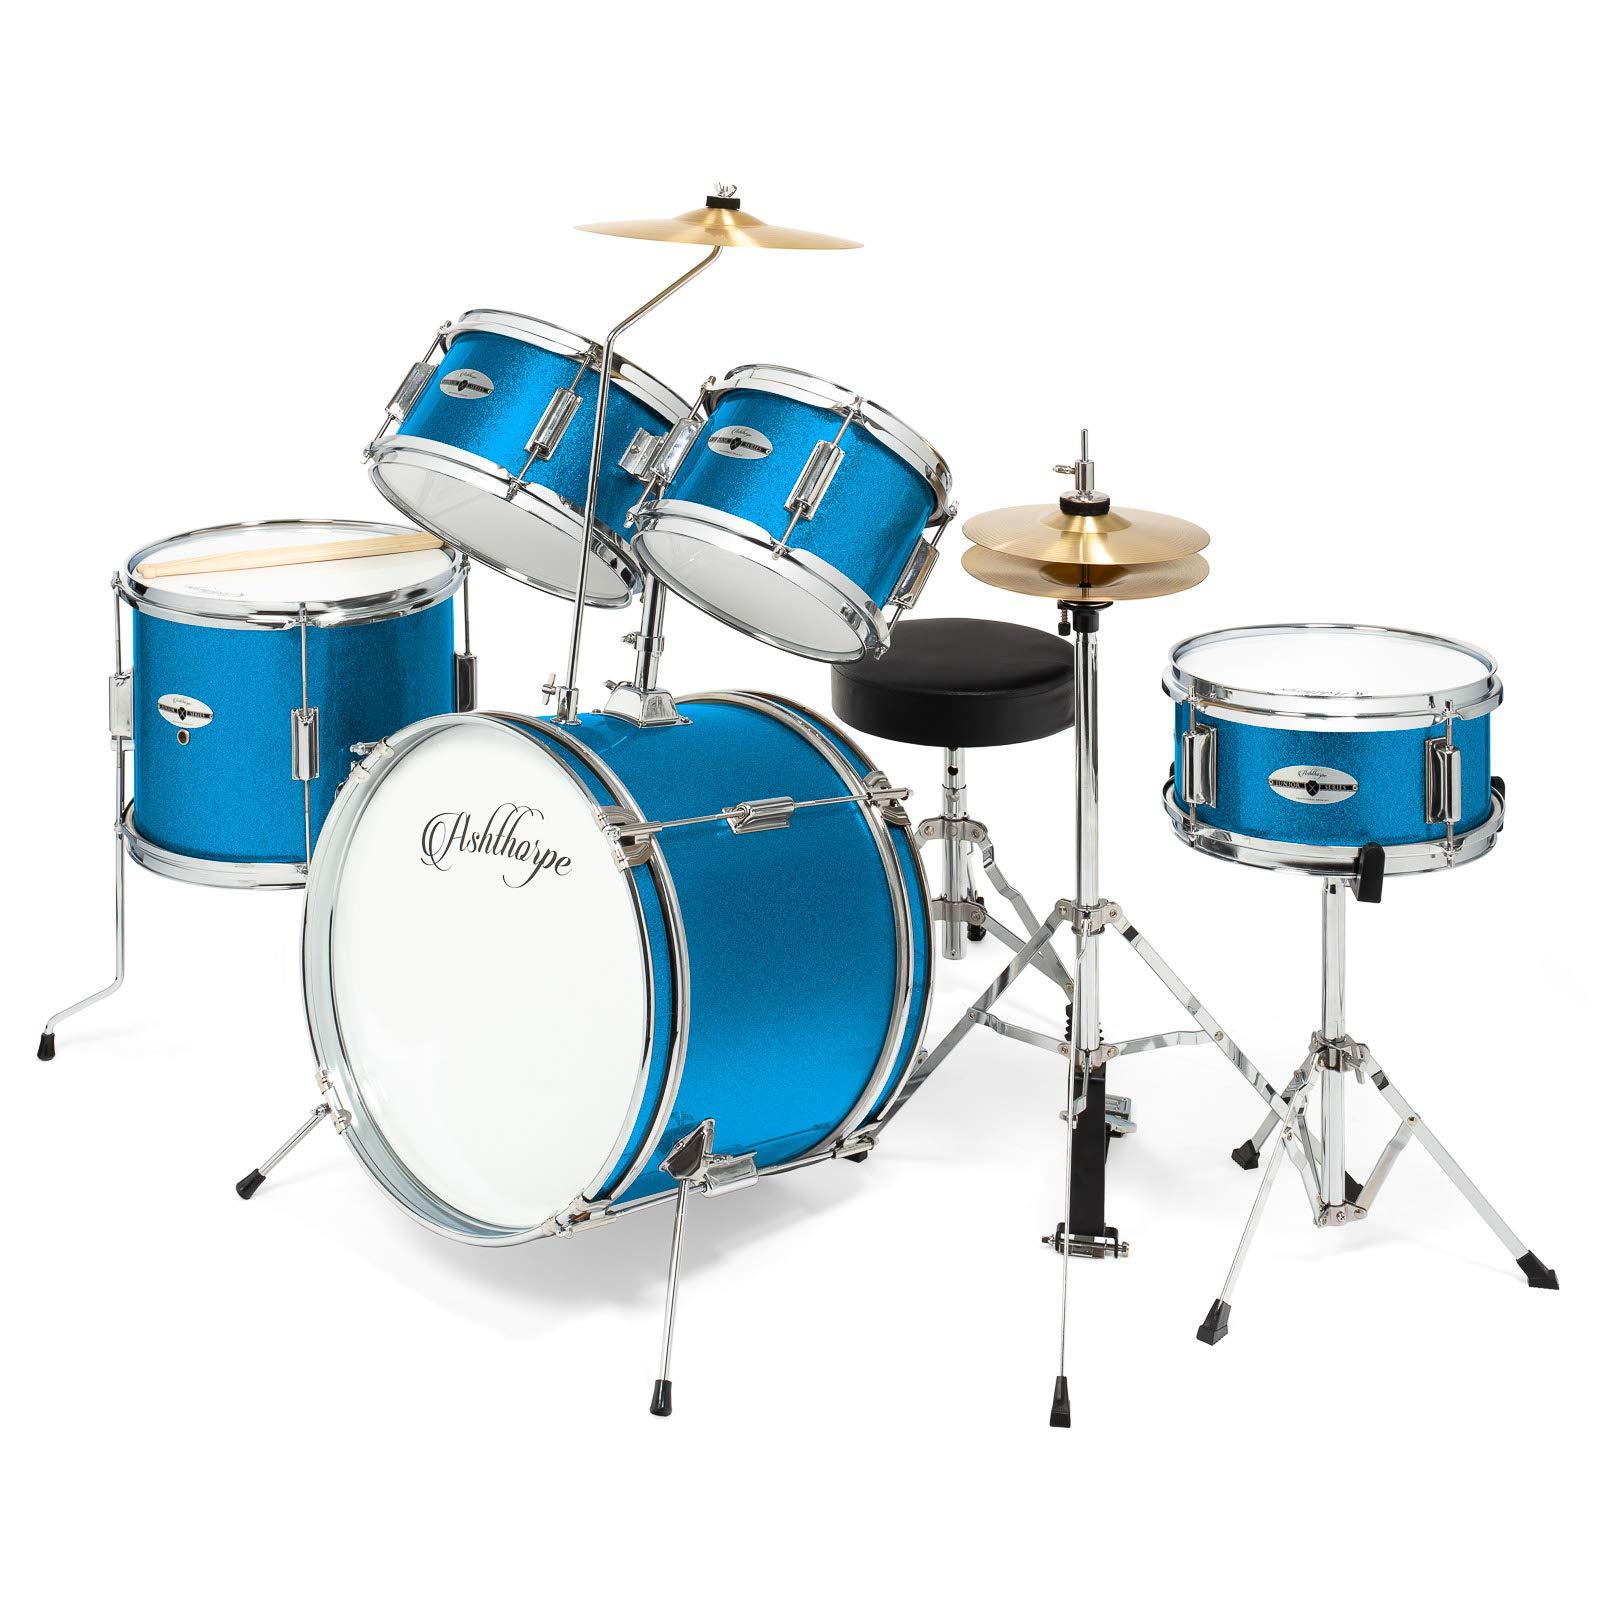 Ashthorpe 5-Piece Complete Kid's Junior Drum Set with Genuine Brass Cymbals - Children's Advanced Beginner Kit with 16'' Bass, Adjustable Throne, Cymbals, Hi-Hats, Pedals & Drumsticks - Blue